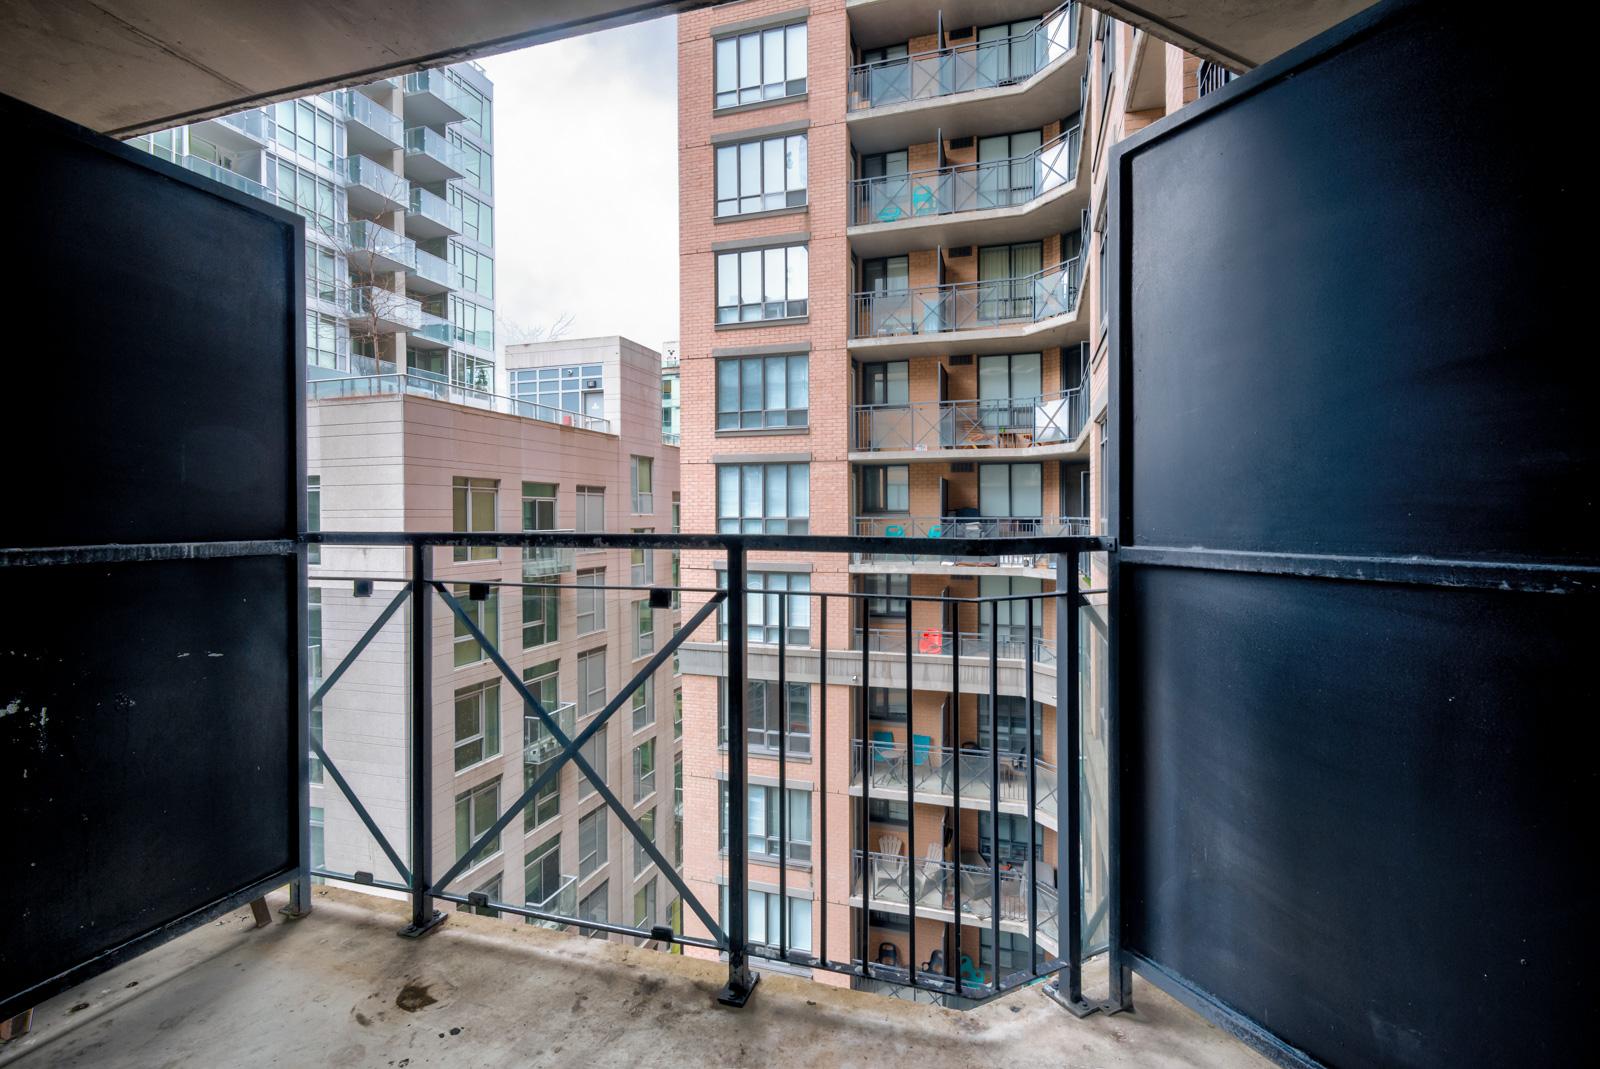 2 black dividers plus iron railing of balcony.